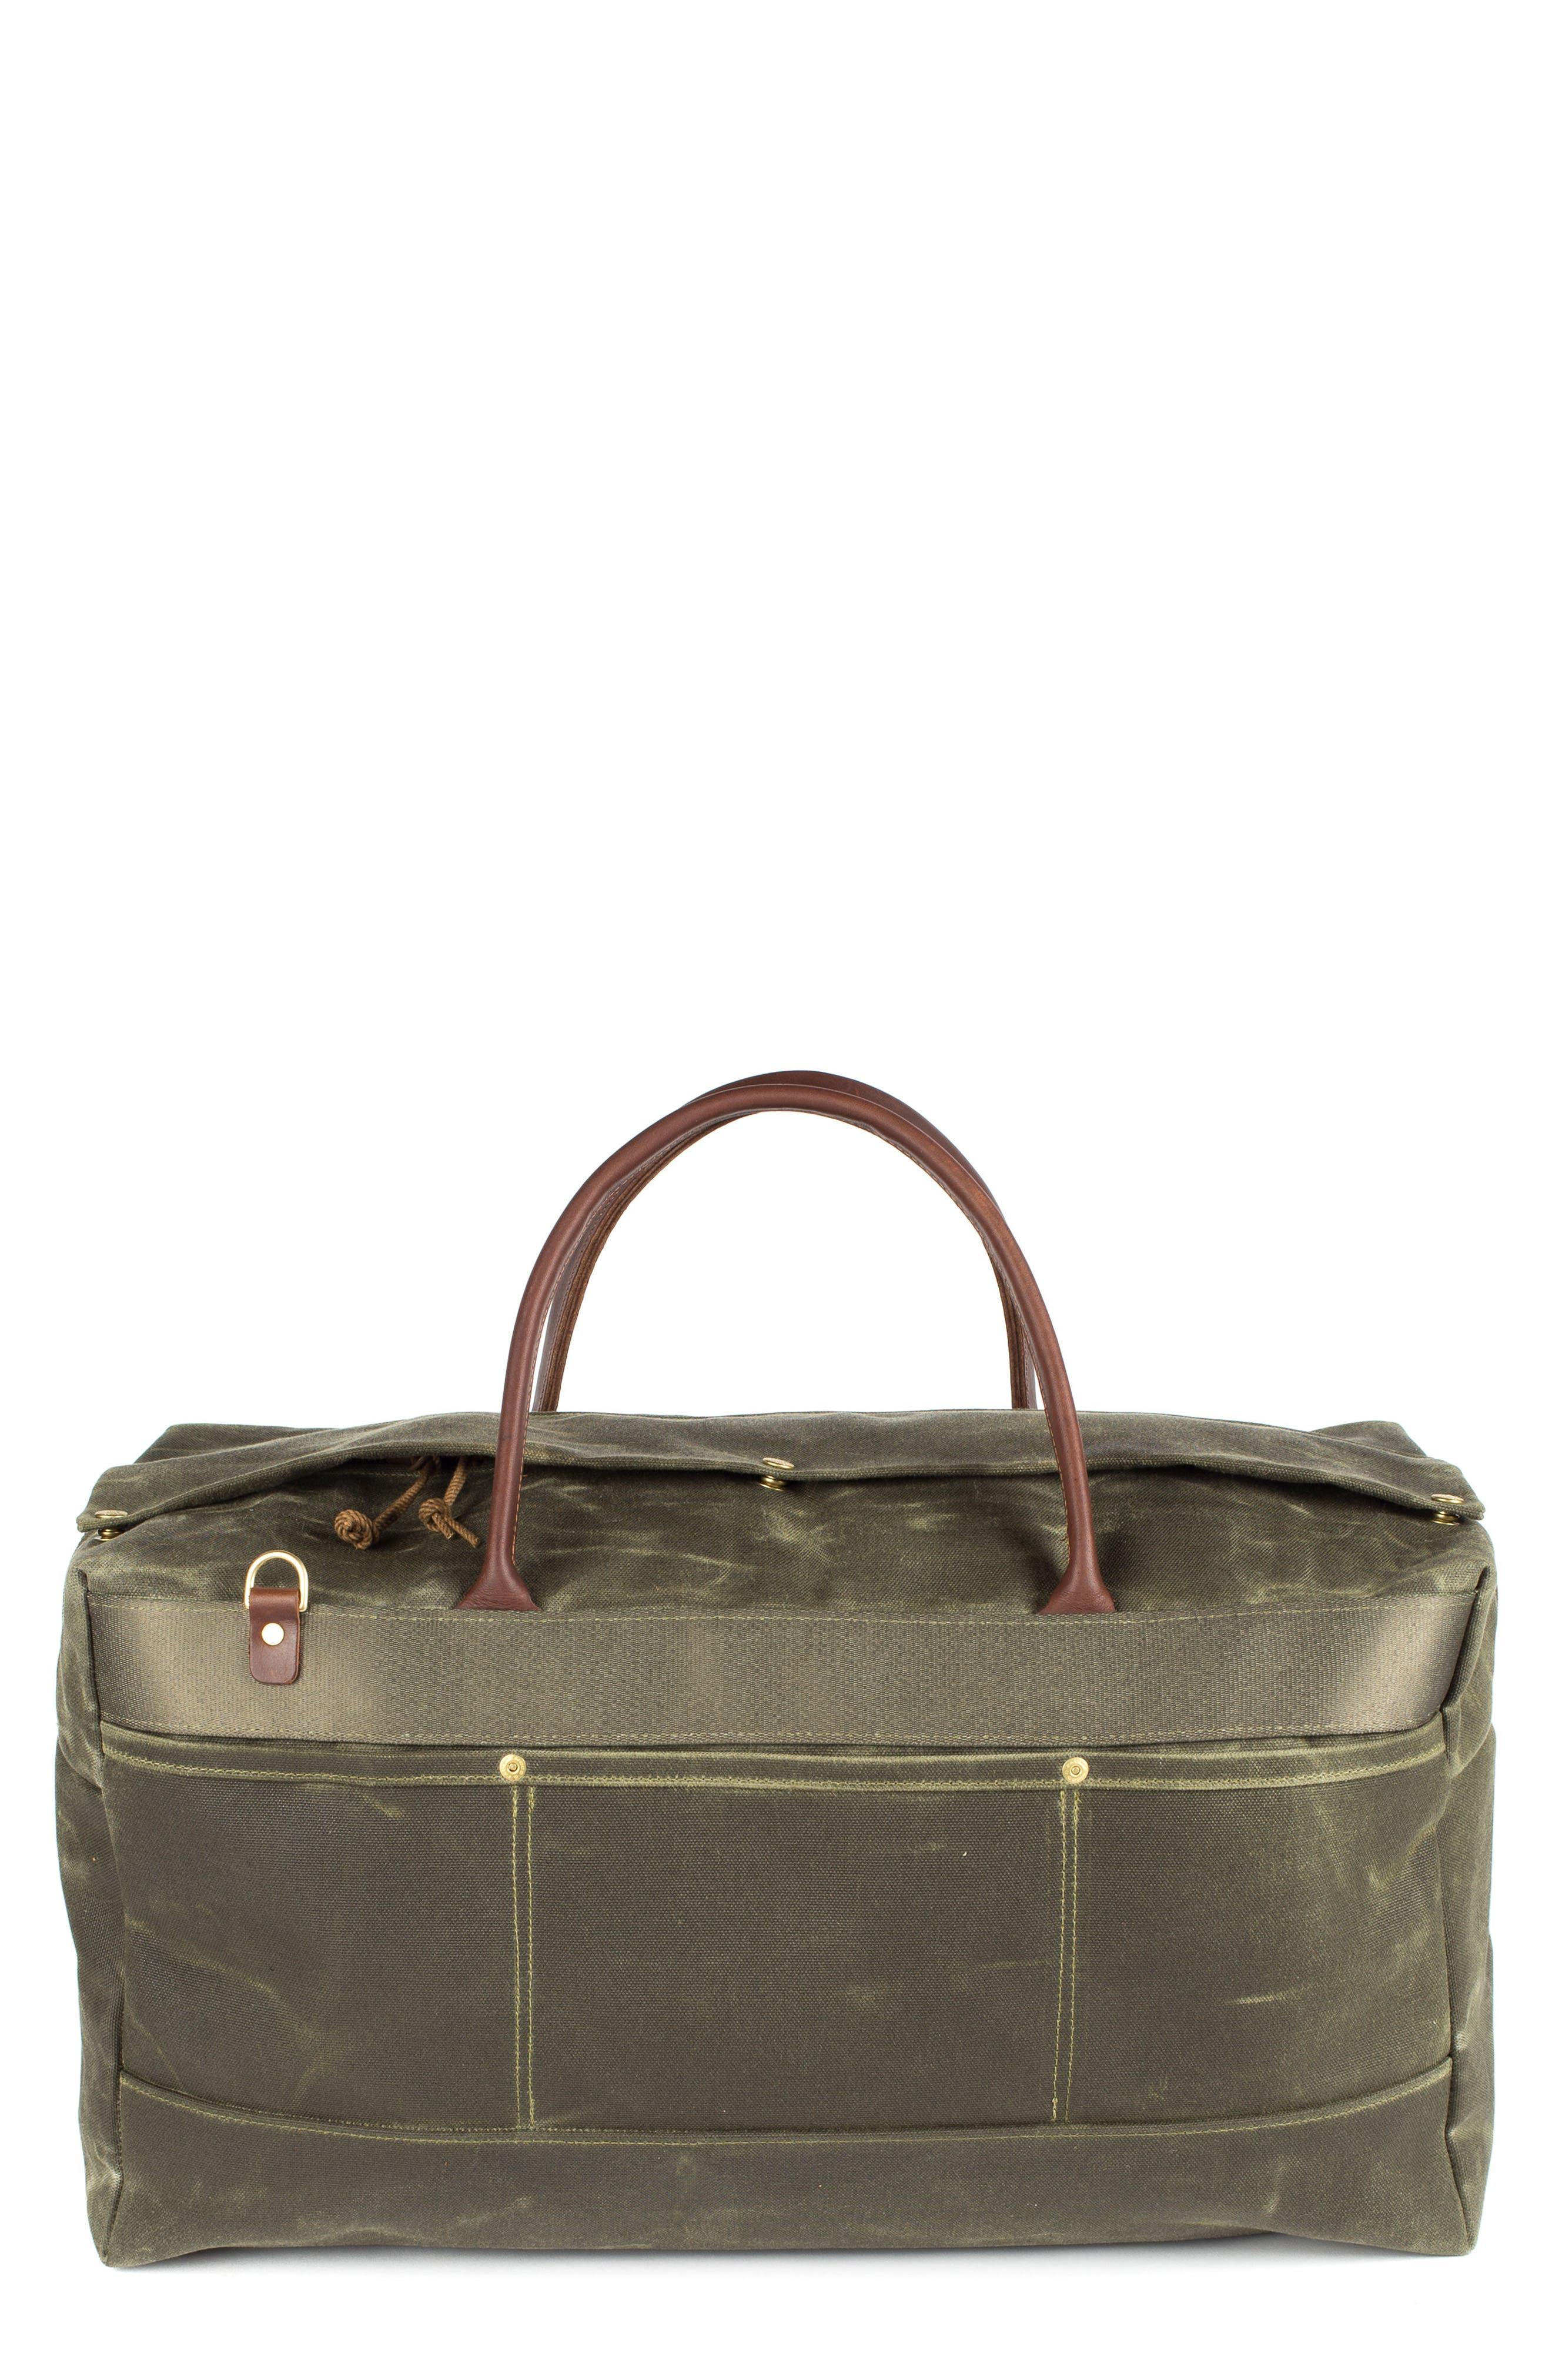 Grand Tourer Waxed Canvas Duffel Bag,                         Main,                         color, Balmoral Moss